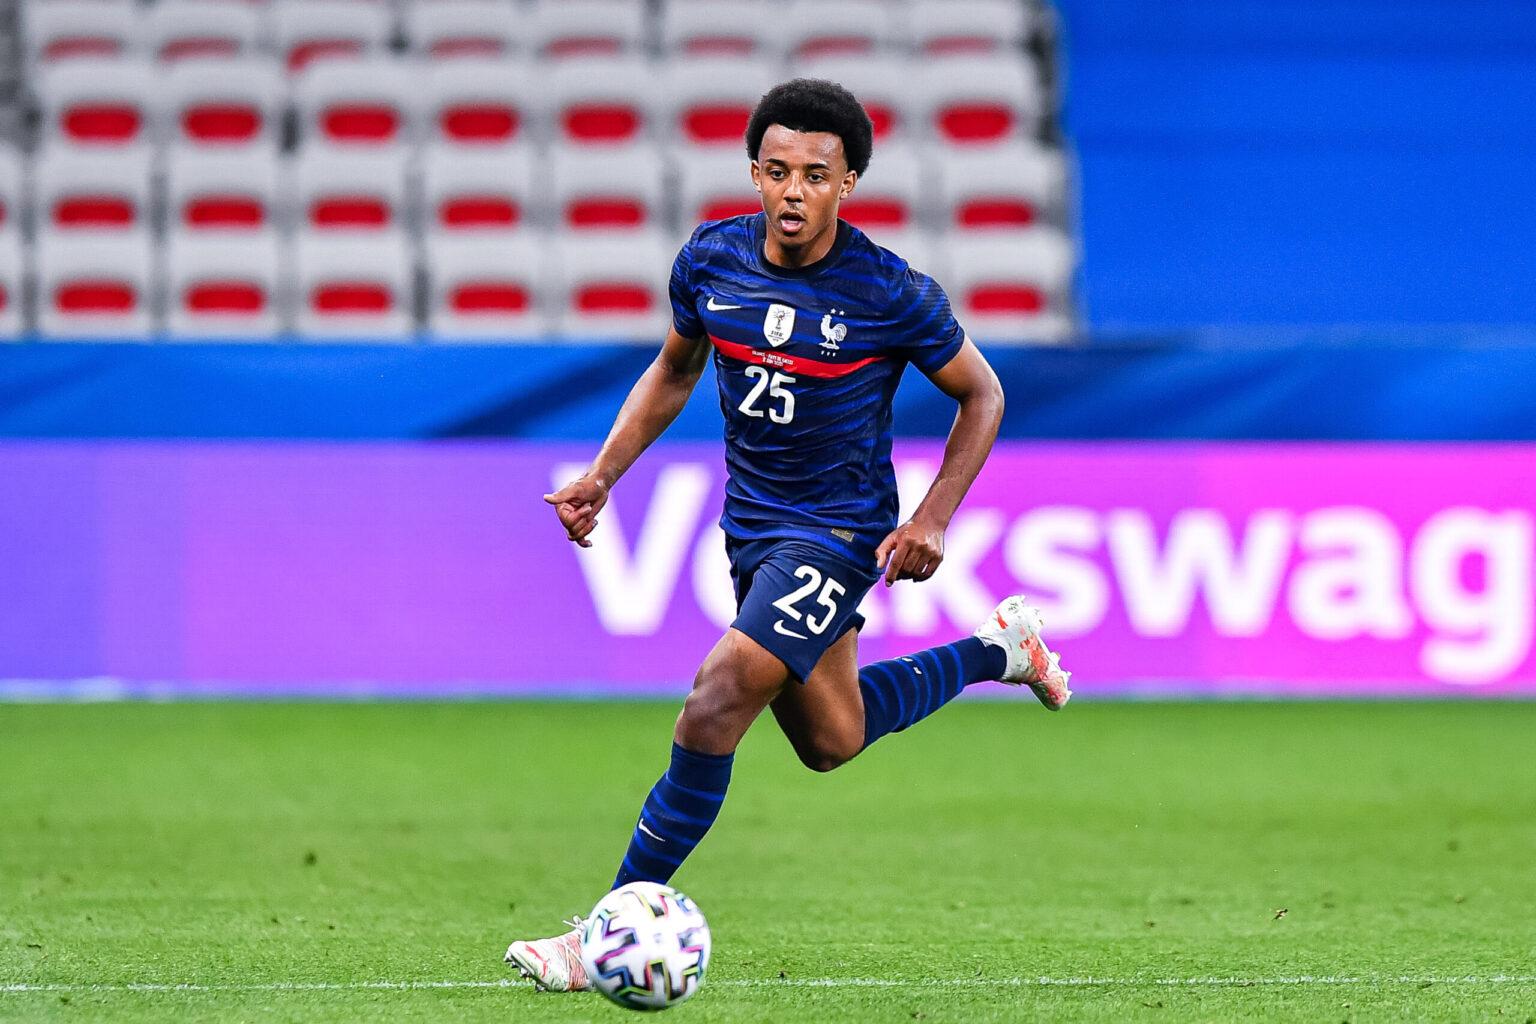 Jules koundé 1 tanggal lahir / umur: Real, Mercato : Wesley Fofana dans le viseur des Merengues ...